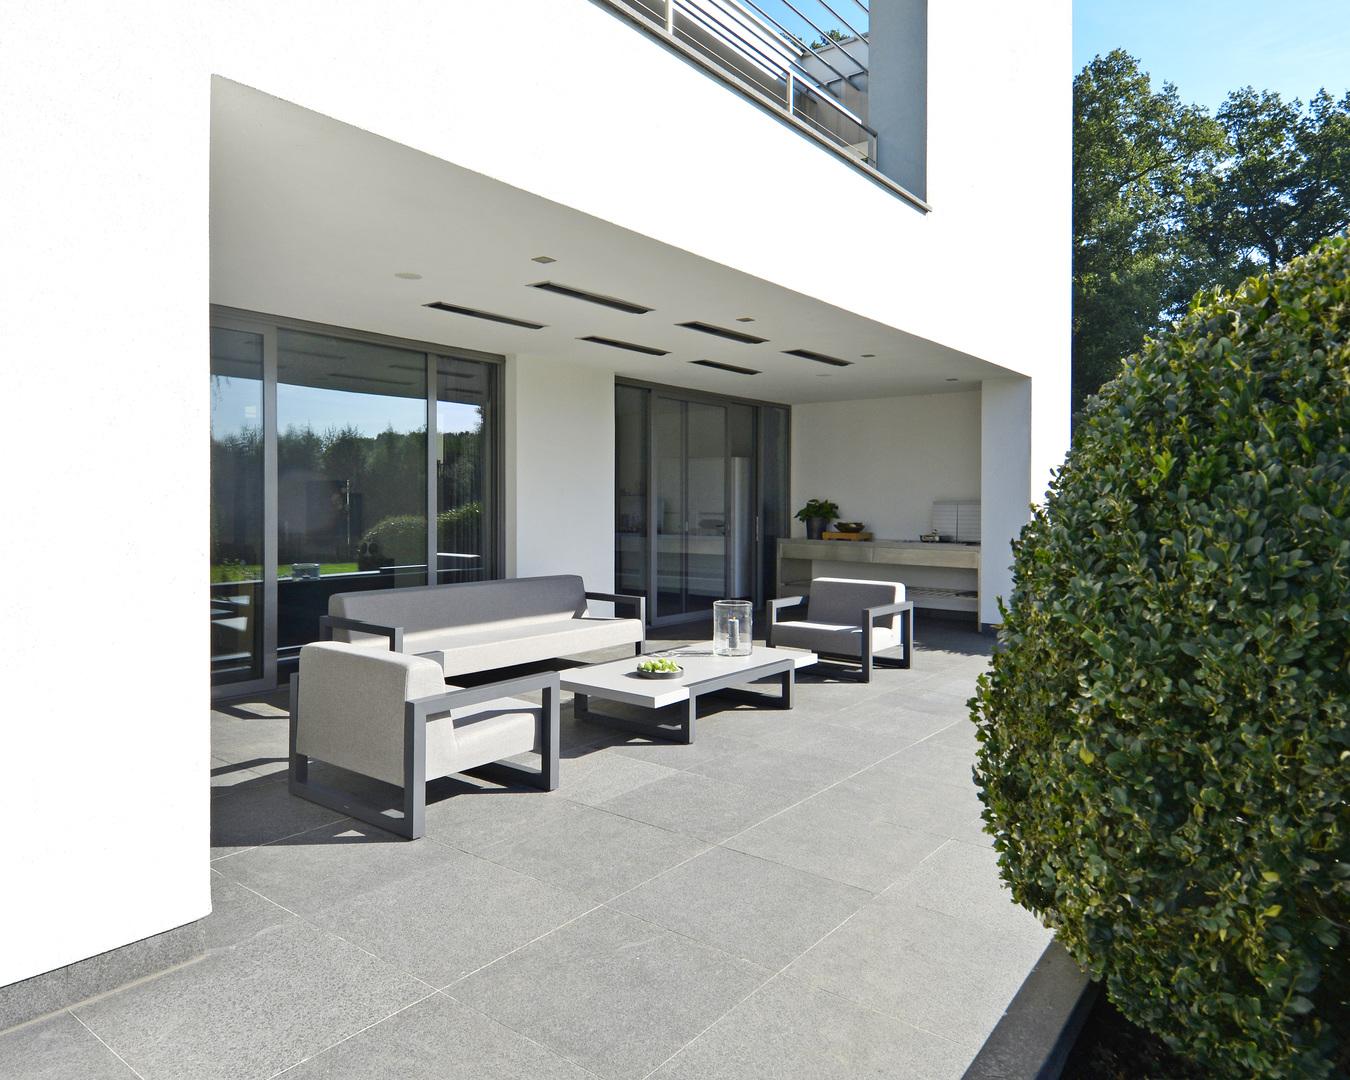 2017 Borek aluminium outdoor fabric Bergen lounge chair, sofa and coffee table (2).jpg